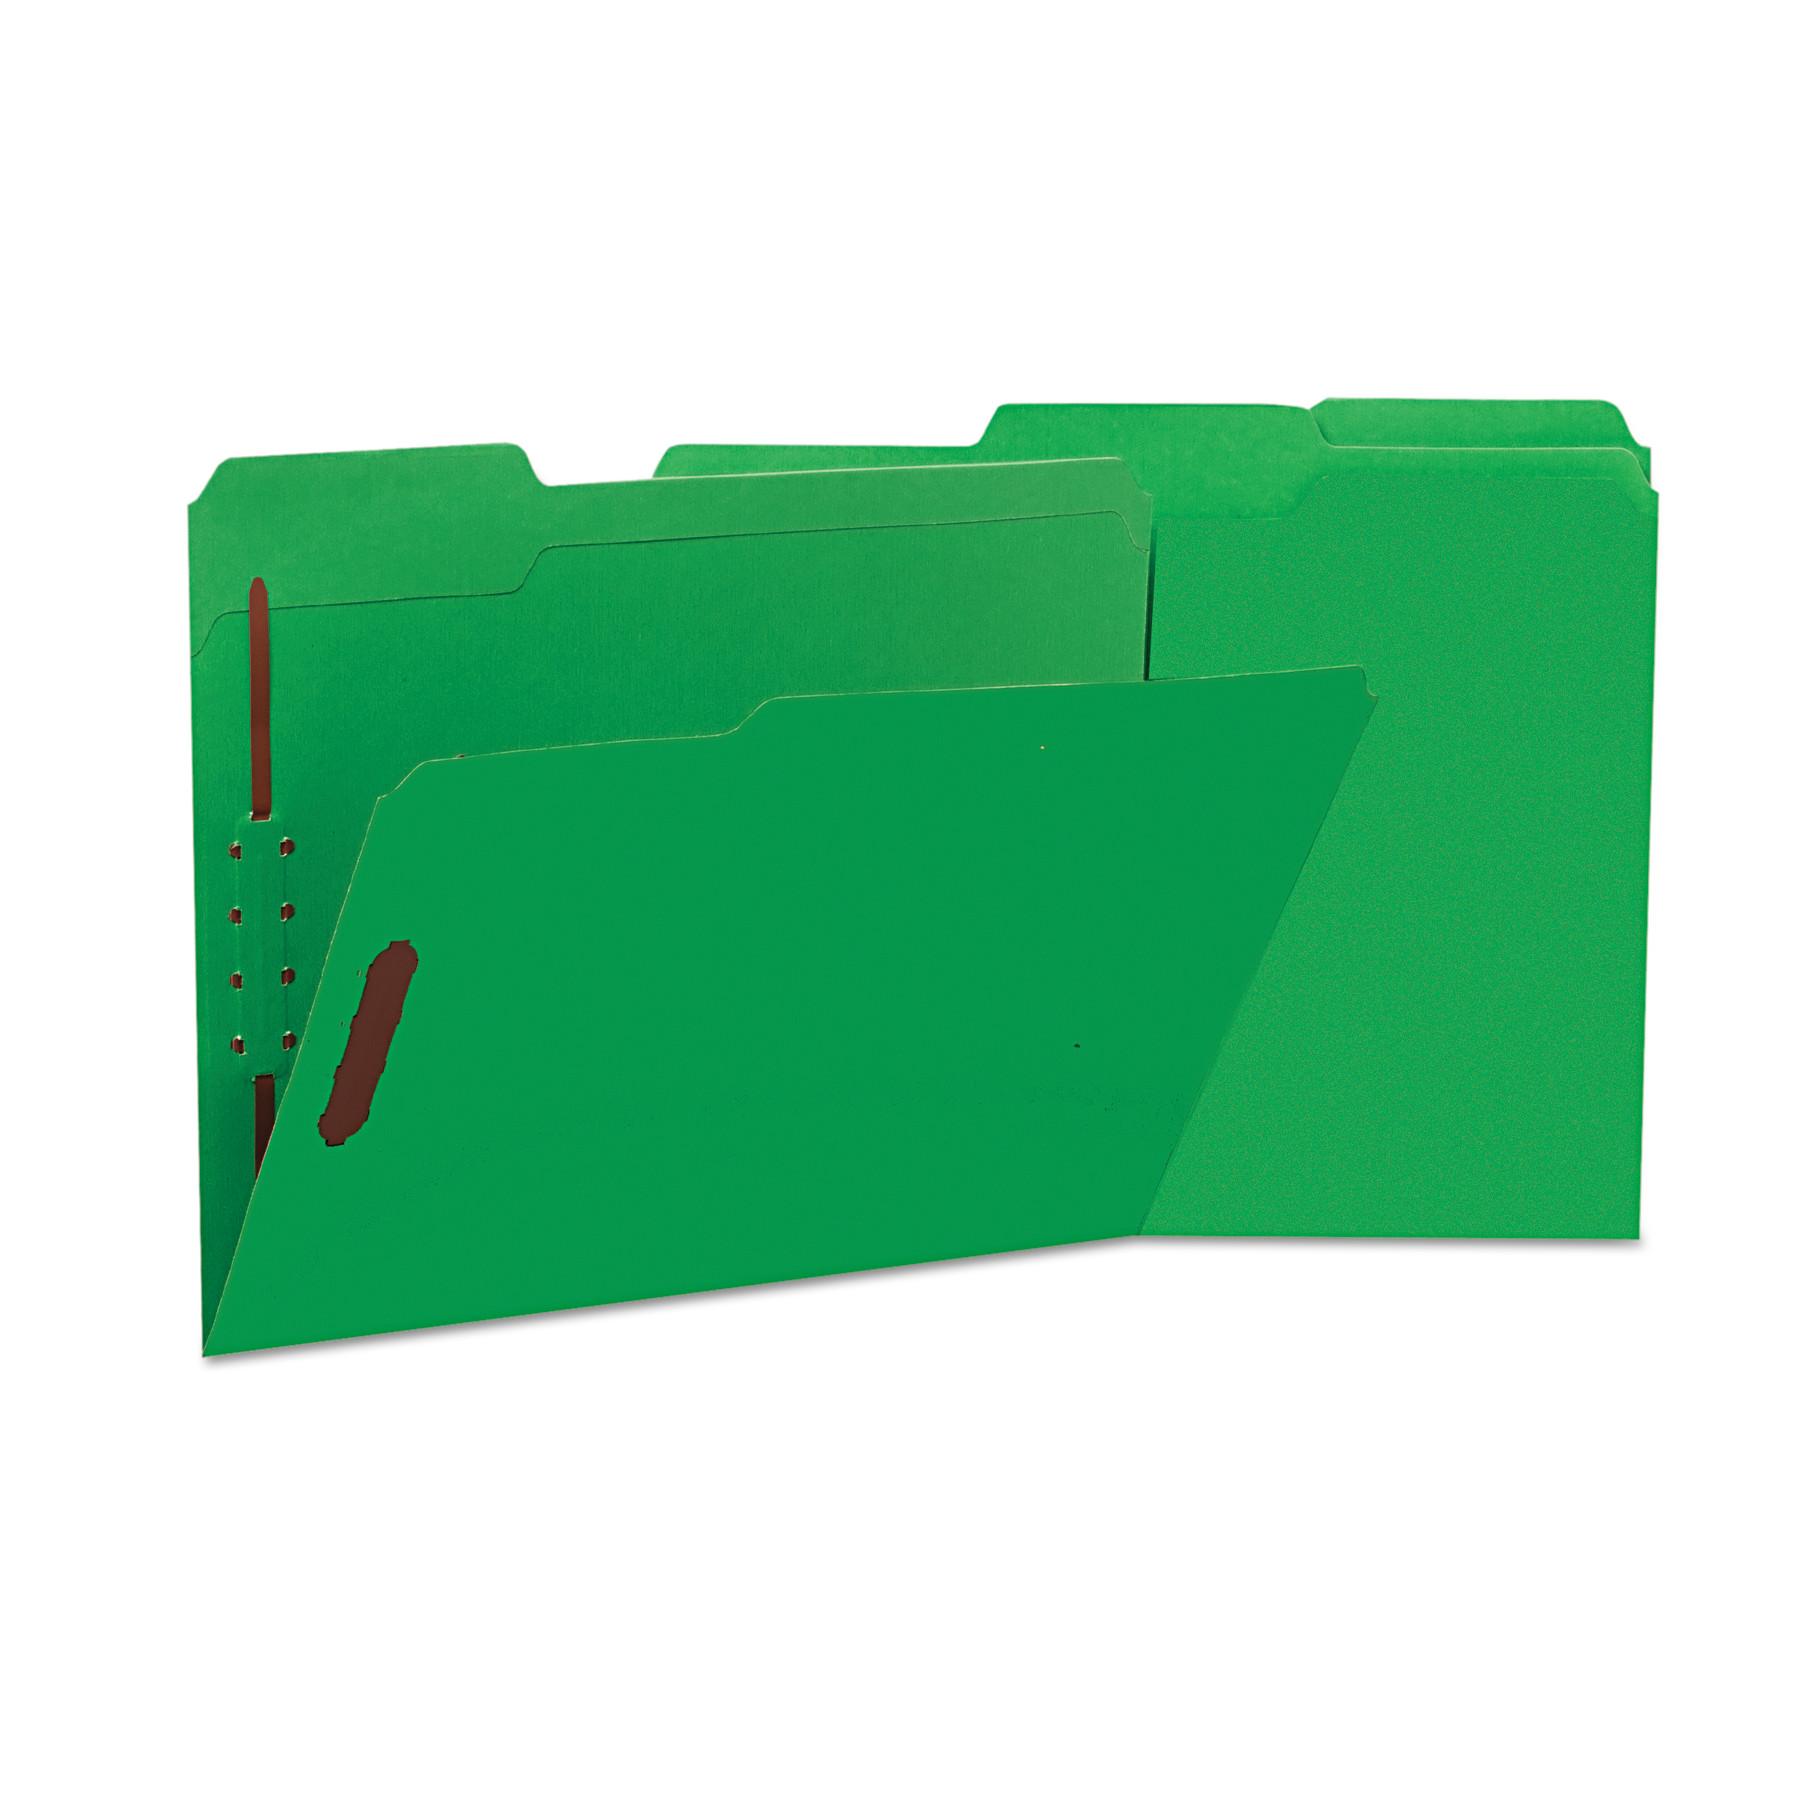 Deluxe Reinforced Top Tab Folders, 2 Fasteners, 1/3 Tab, Letter, Green, 50/Box